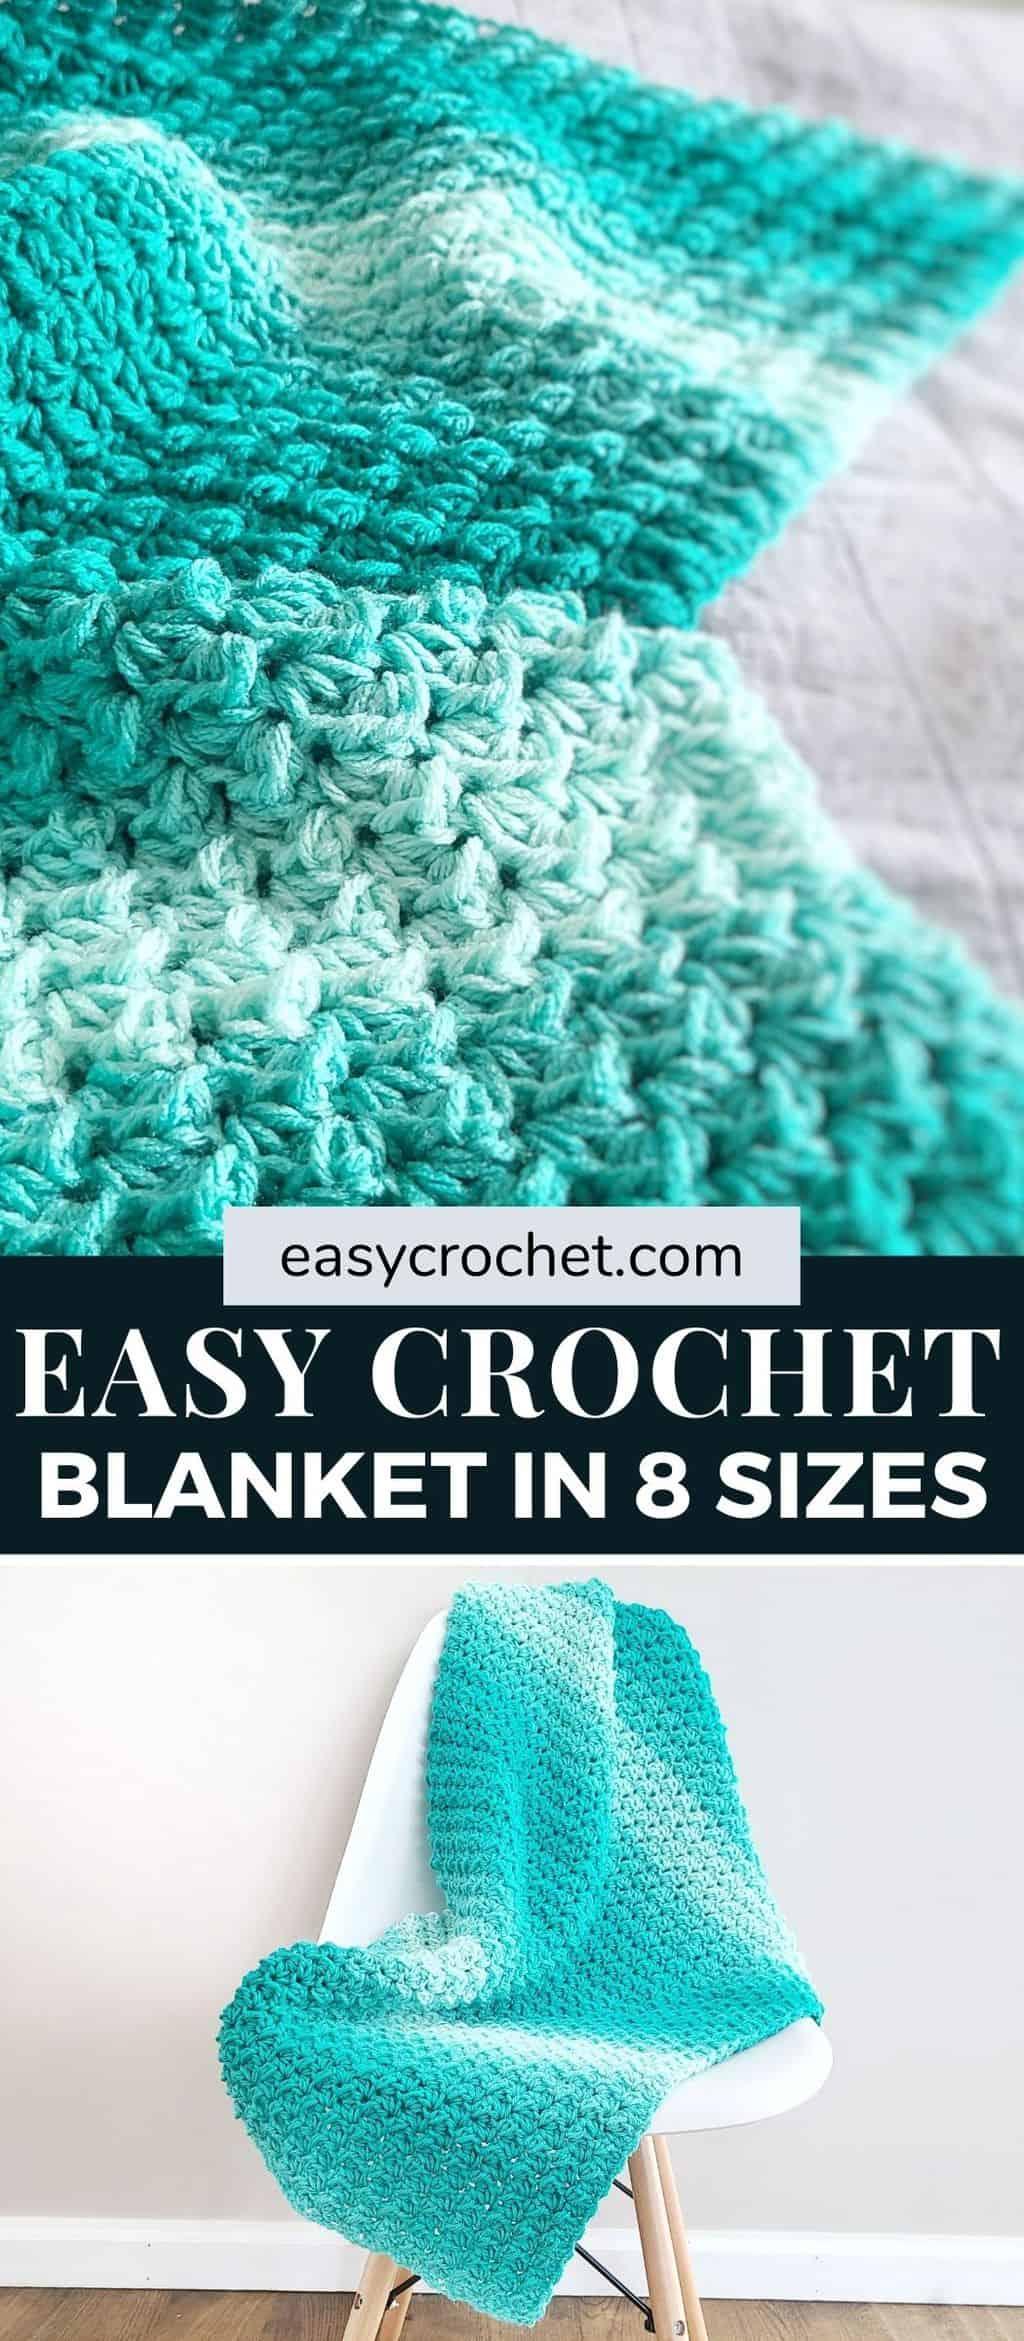 Learn how to crochet this classic crochet blanket pattern in eight different sizes! via @easycrochetcom